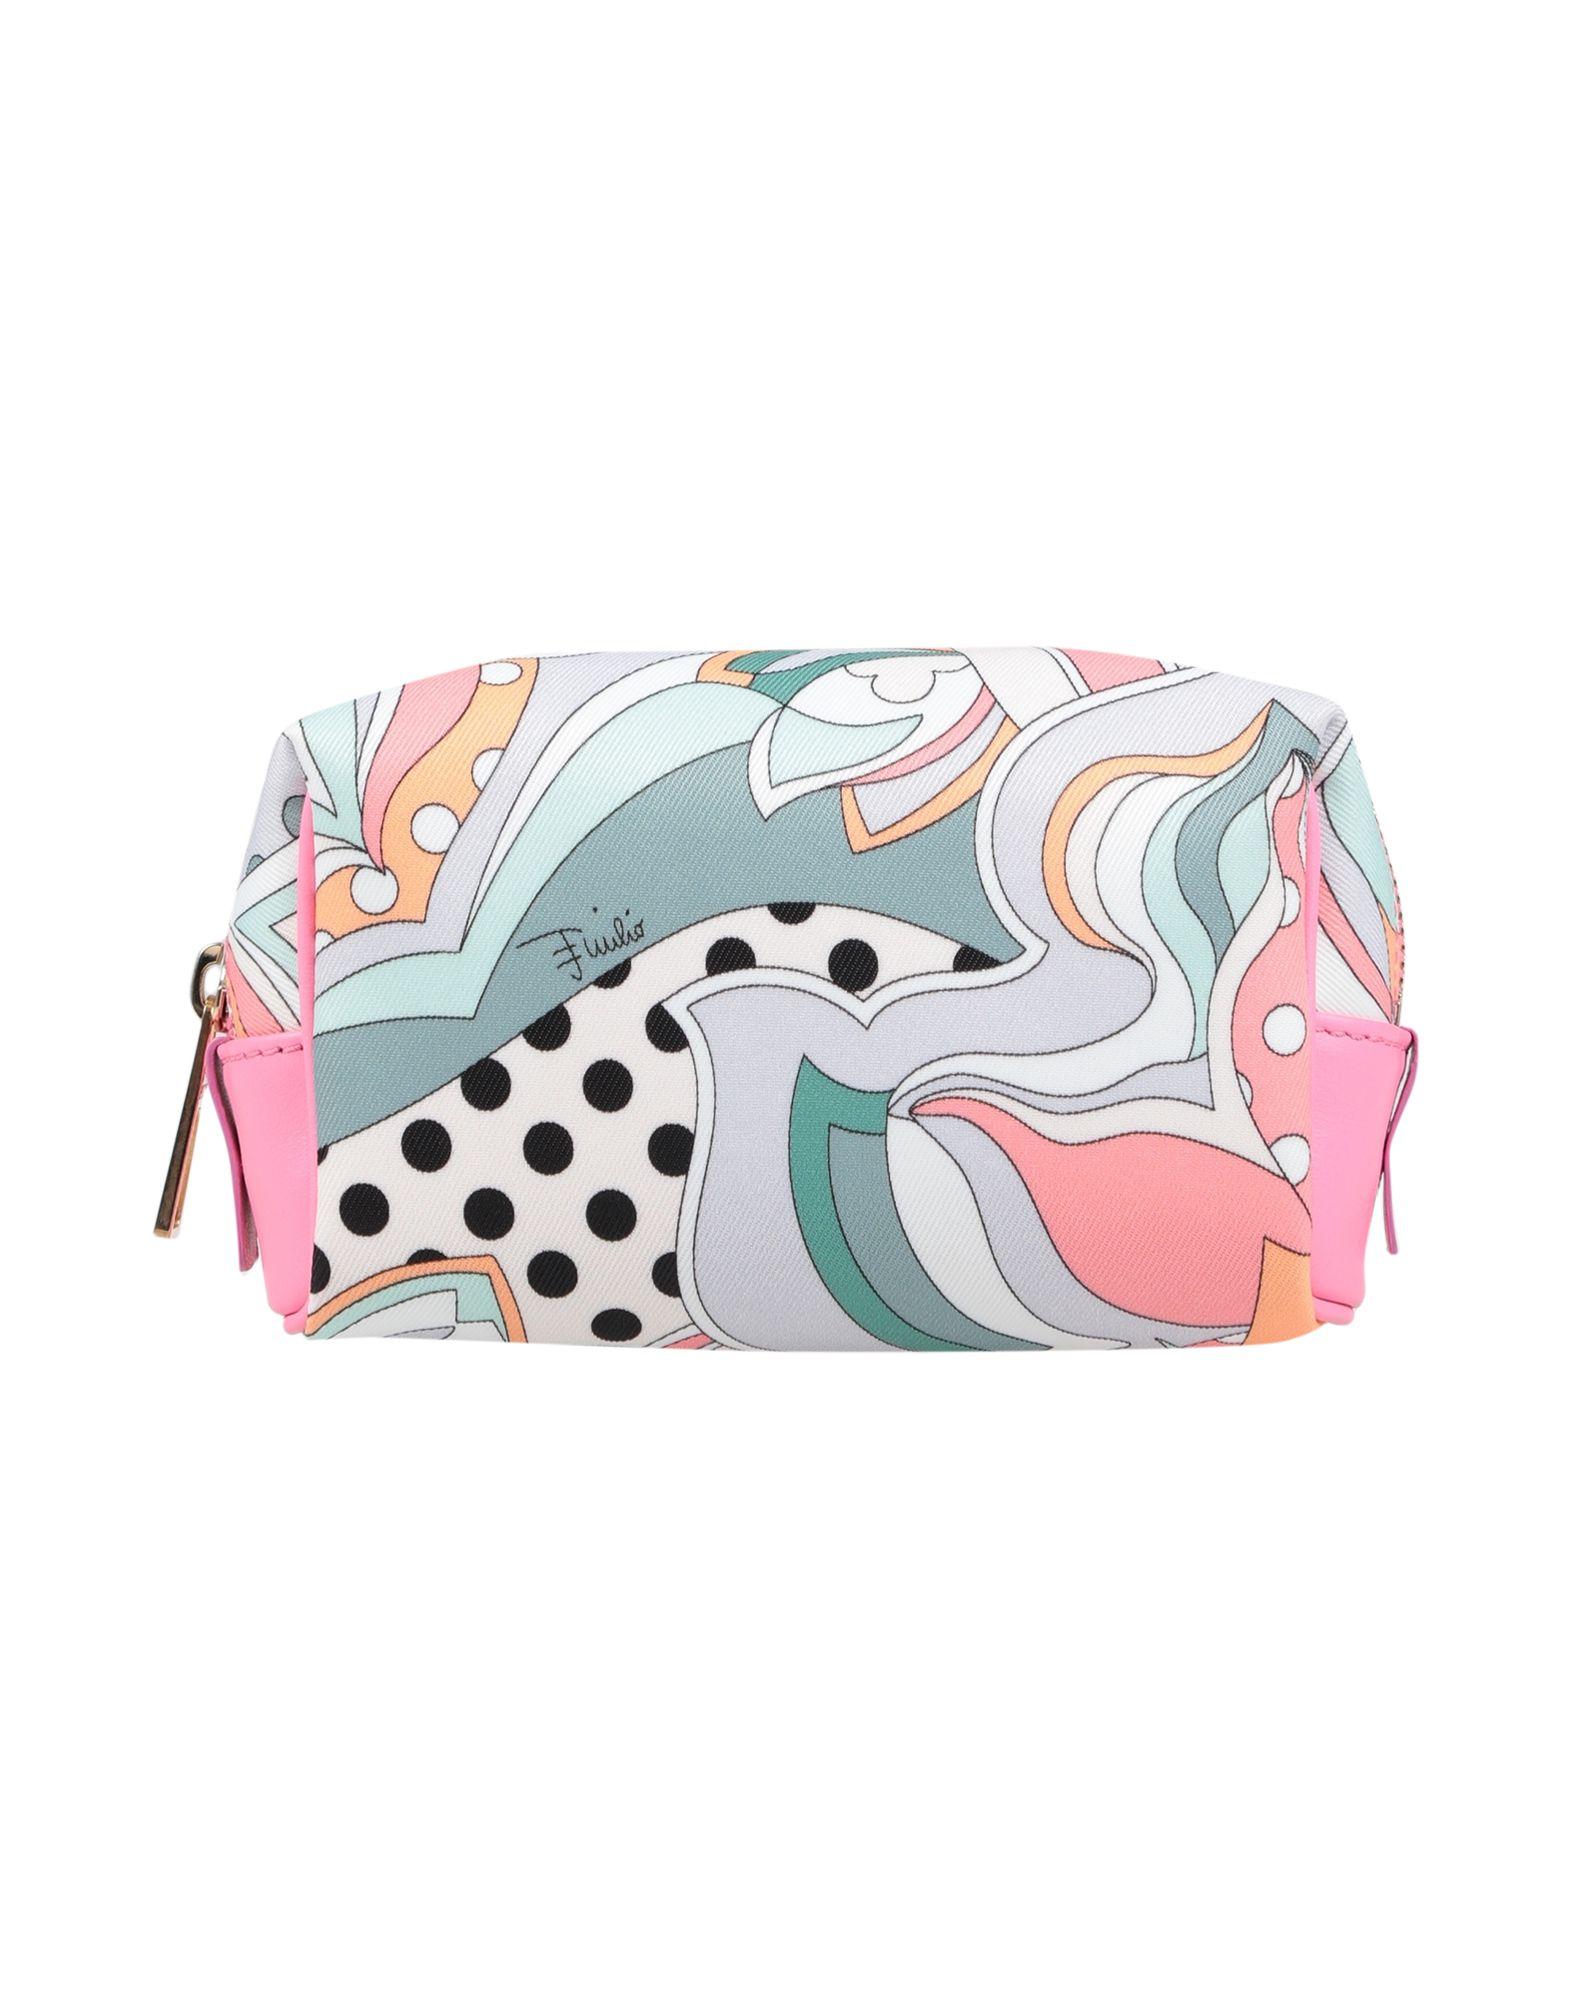 купить EMILIO PUCCI Beauty case дешево